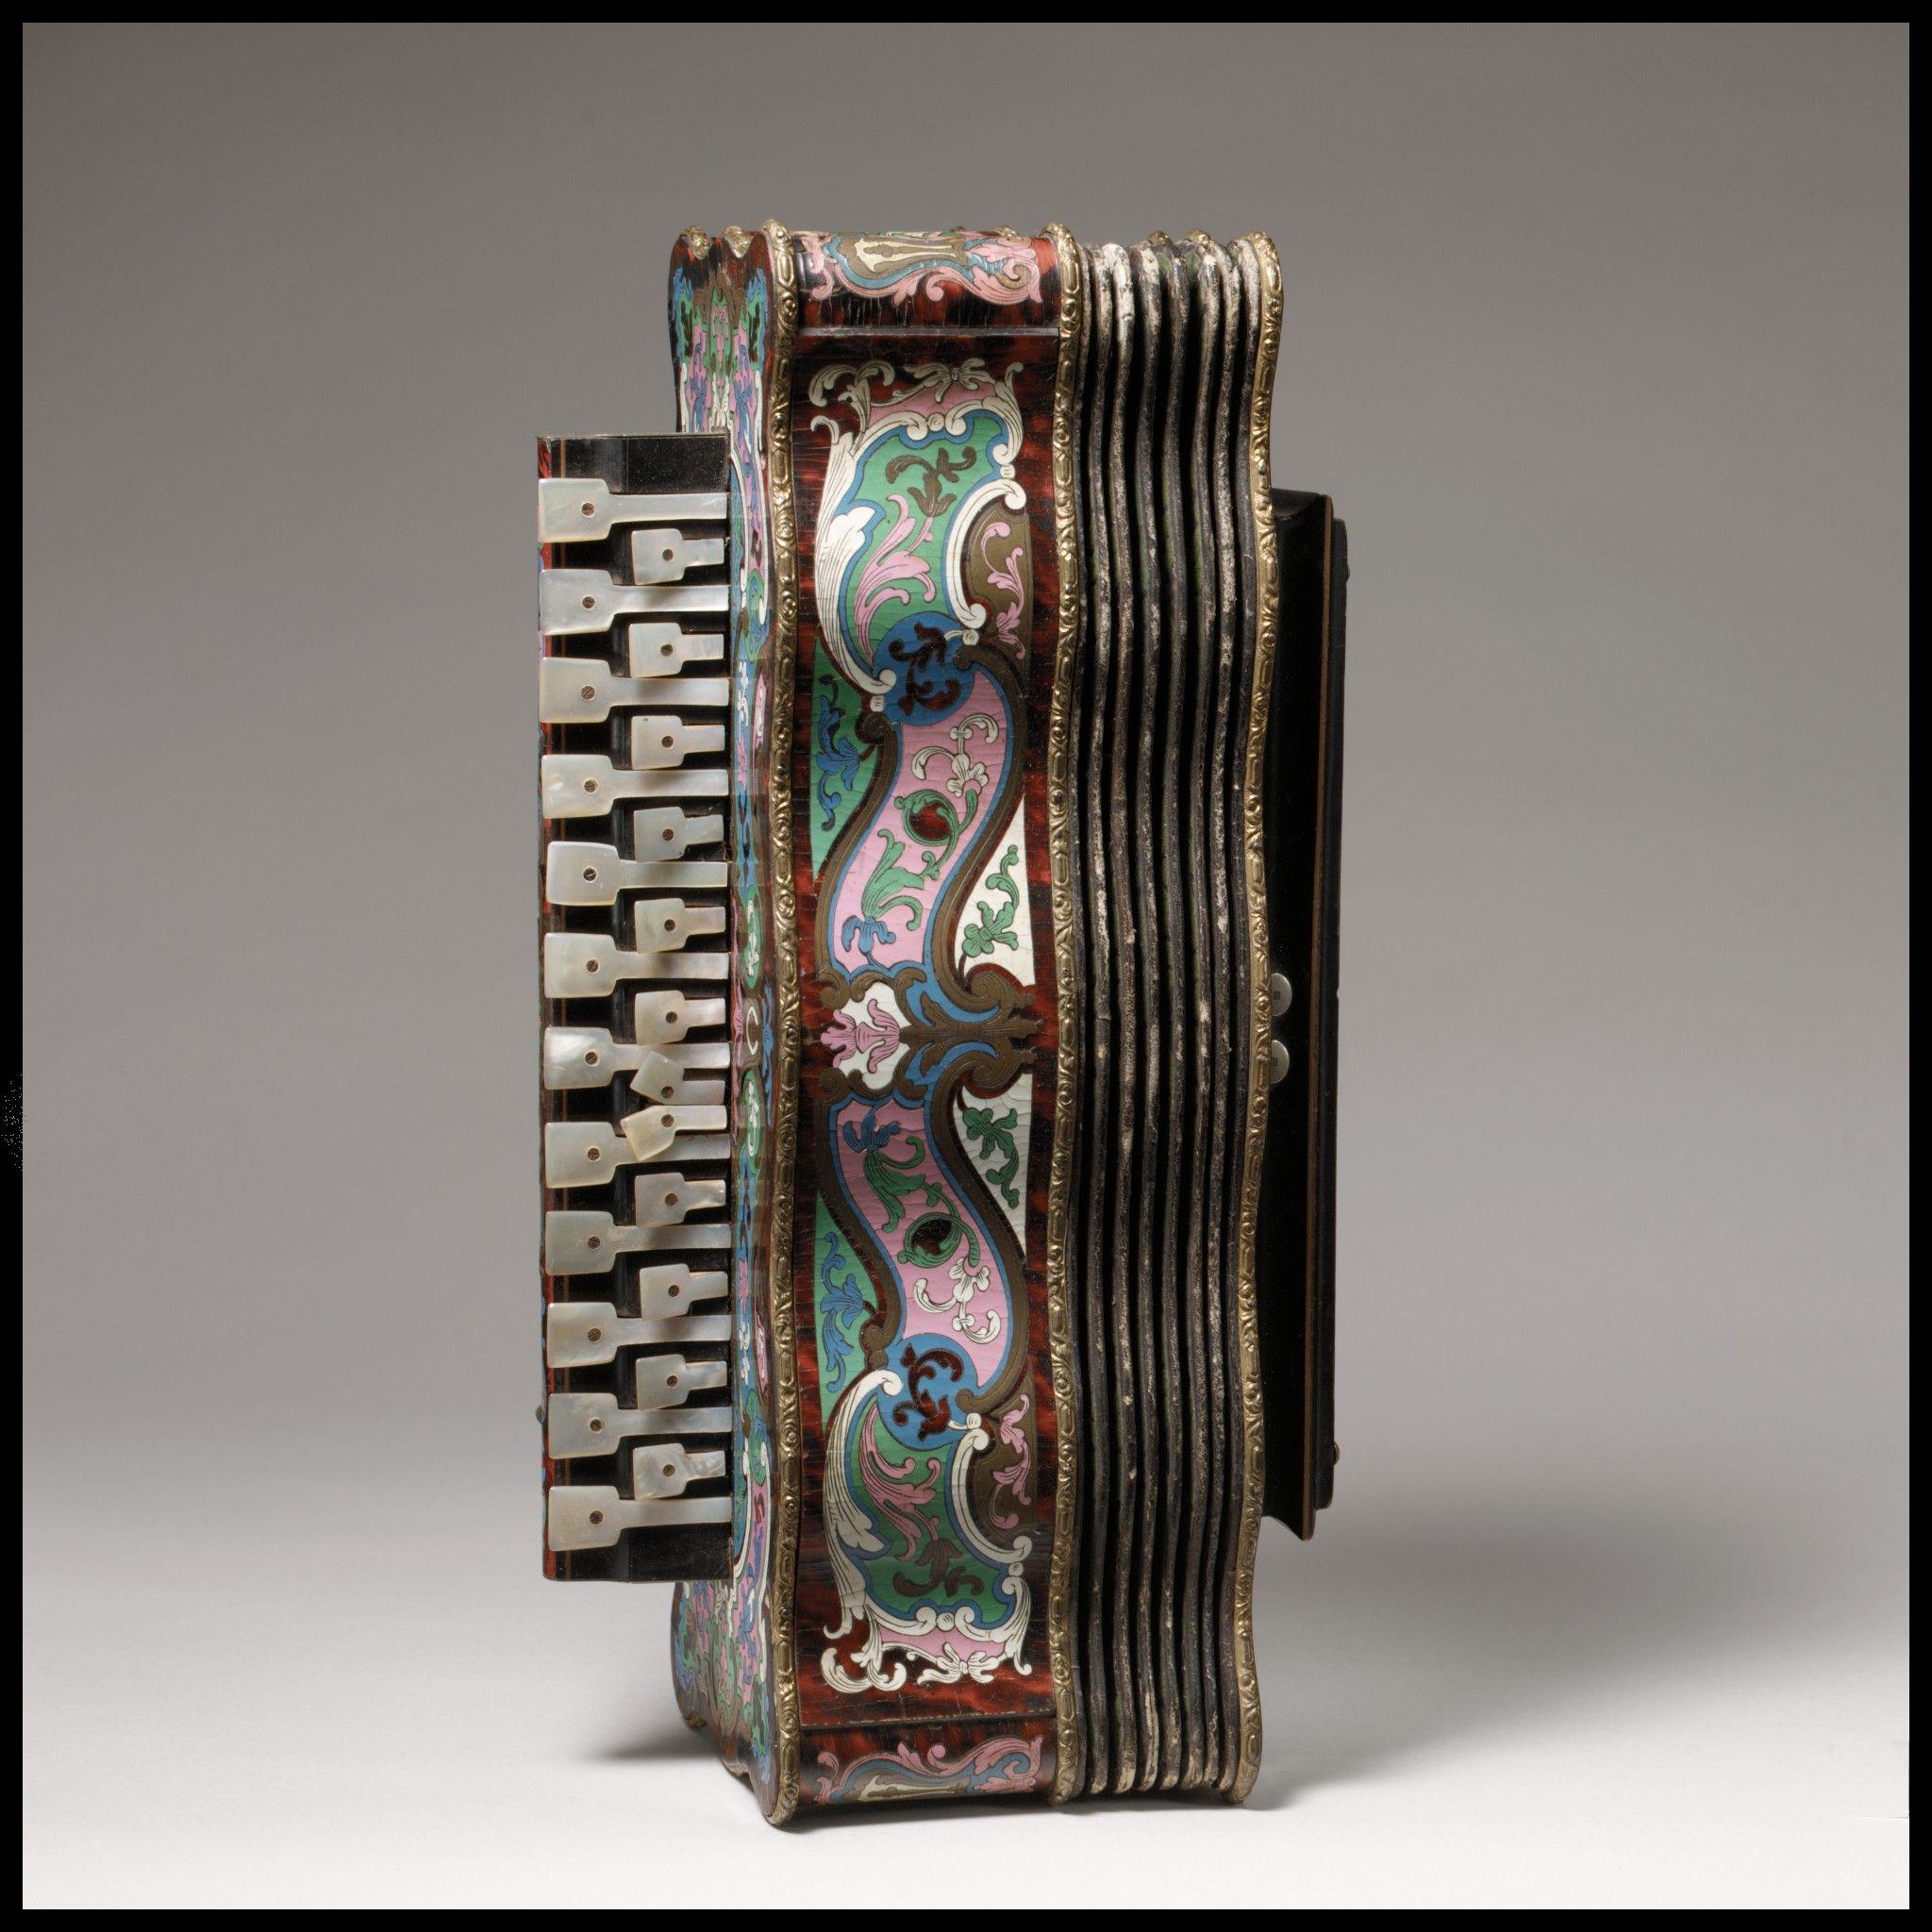 Accordion Maker:Alexandre Pere & Fils 1850–55 Paris, France